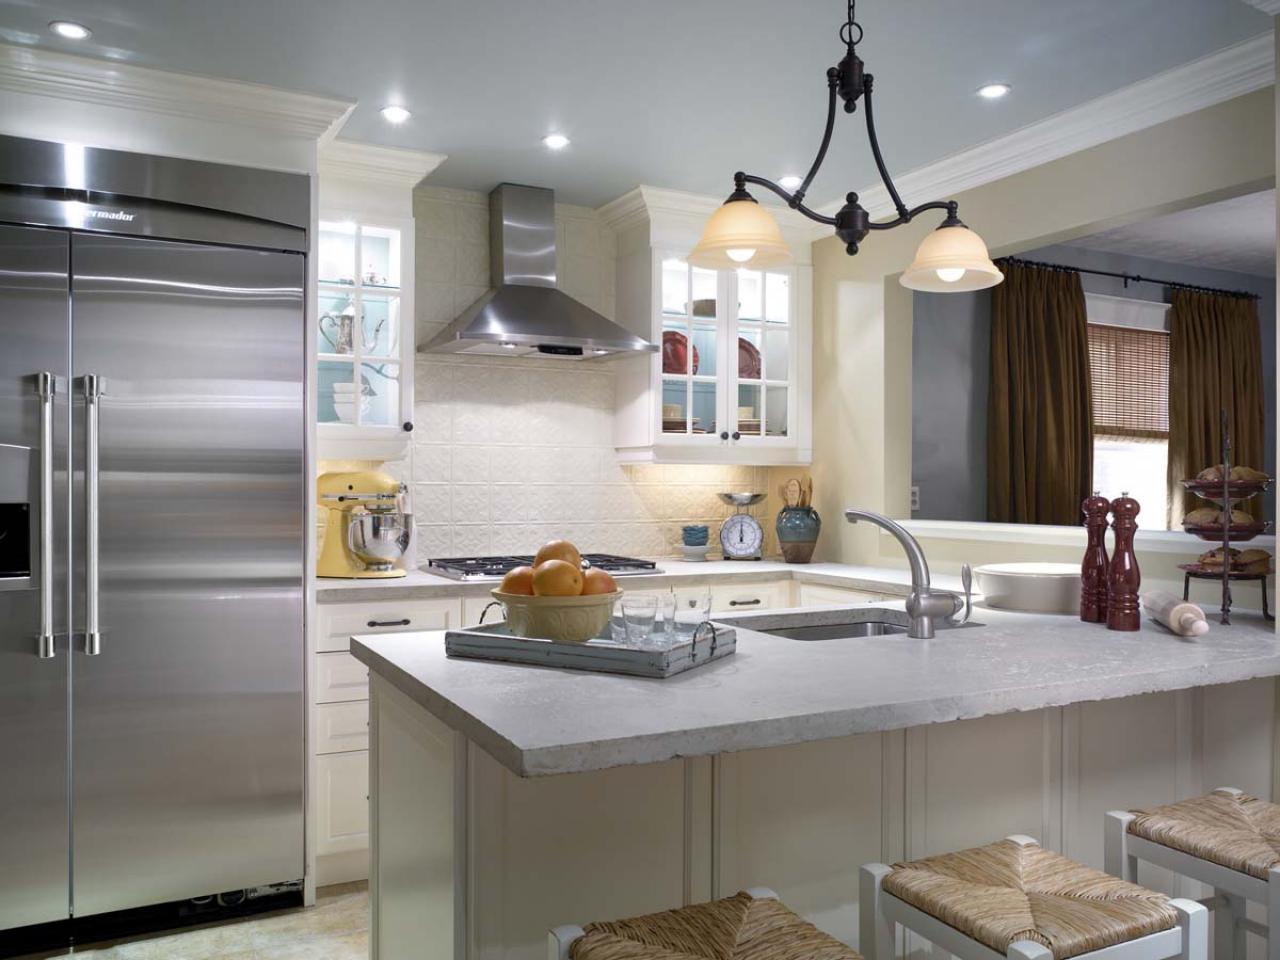 candice olson kitchen layouts photo - 5